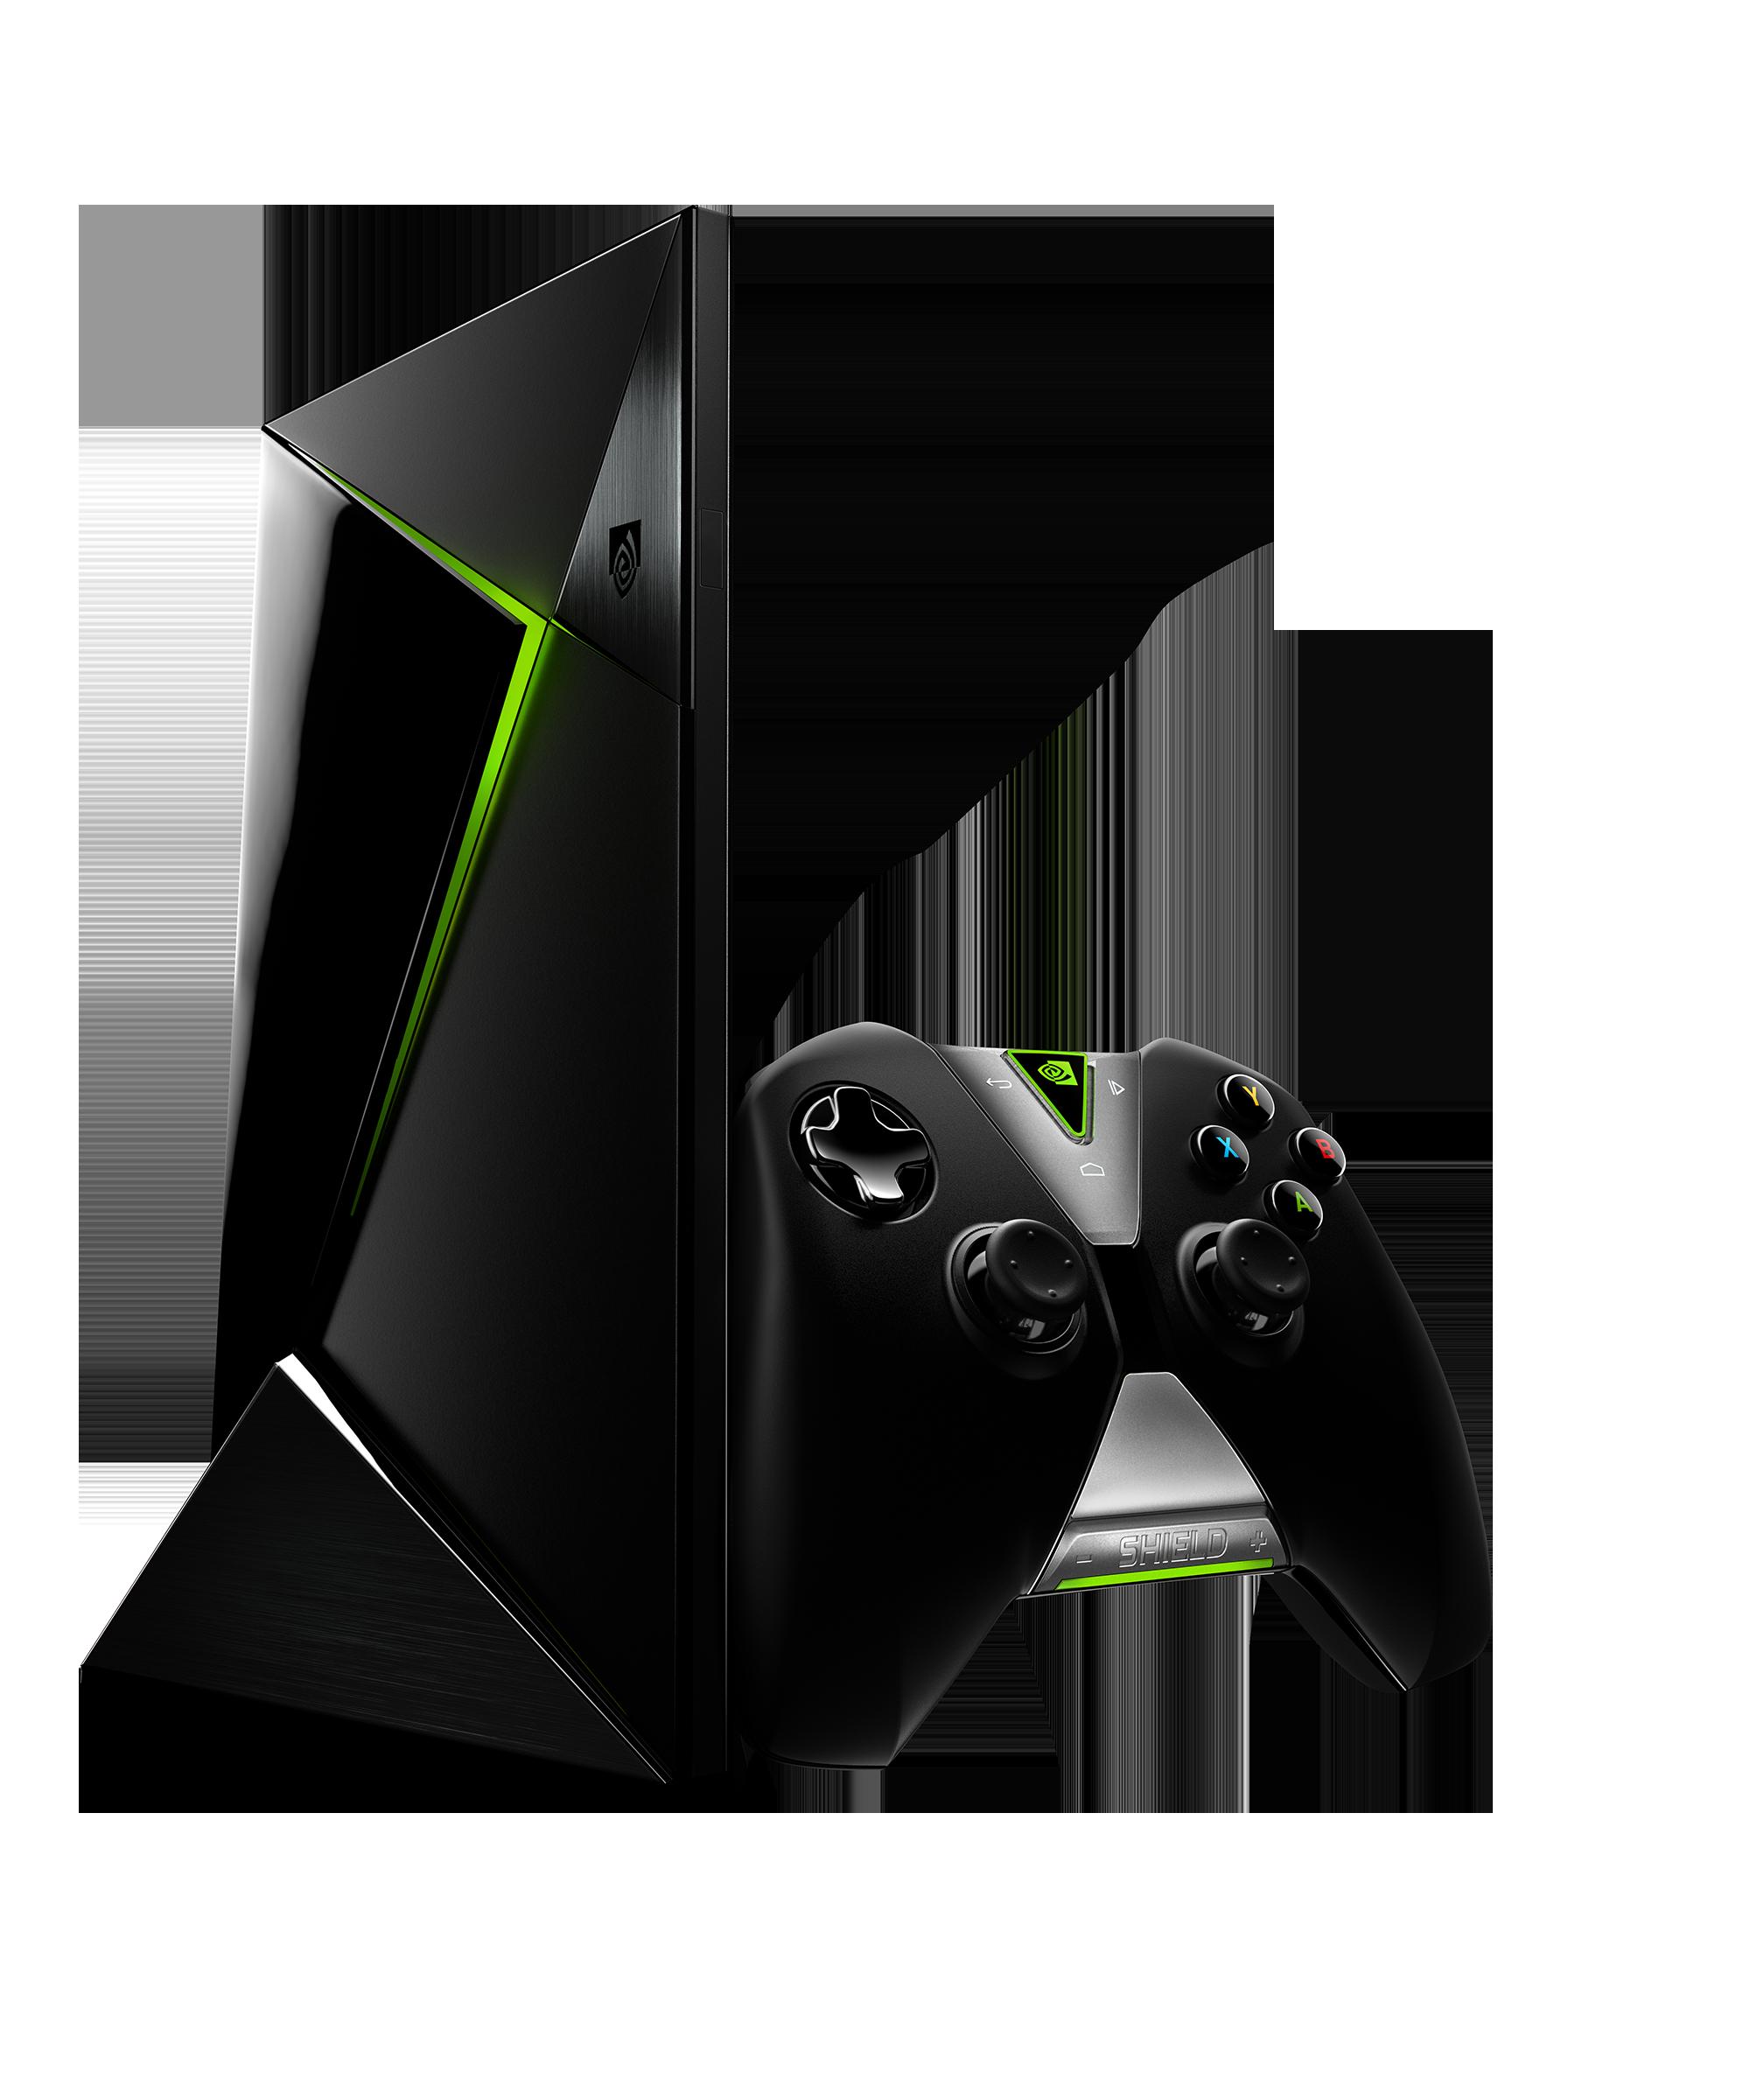 nvidia shield la console android tv propuls e par le tegra x1 frandroid. Black Bedroom Furniture Sets. Home Design Ideas